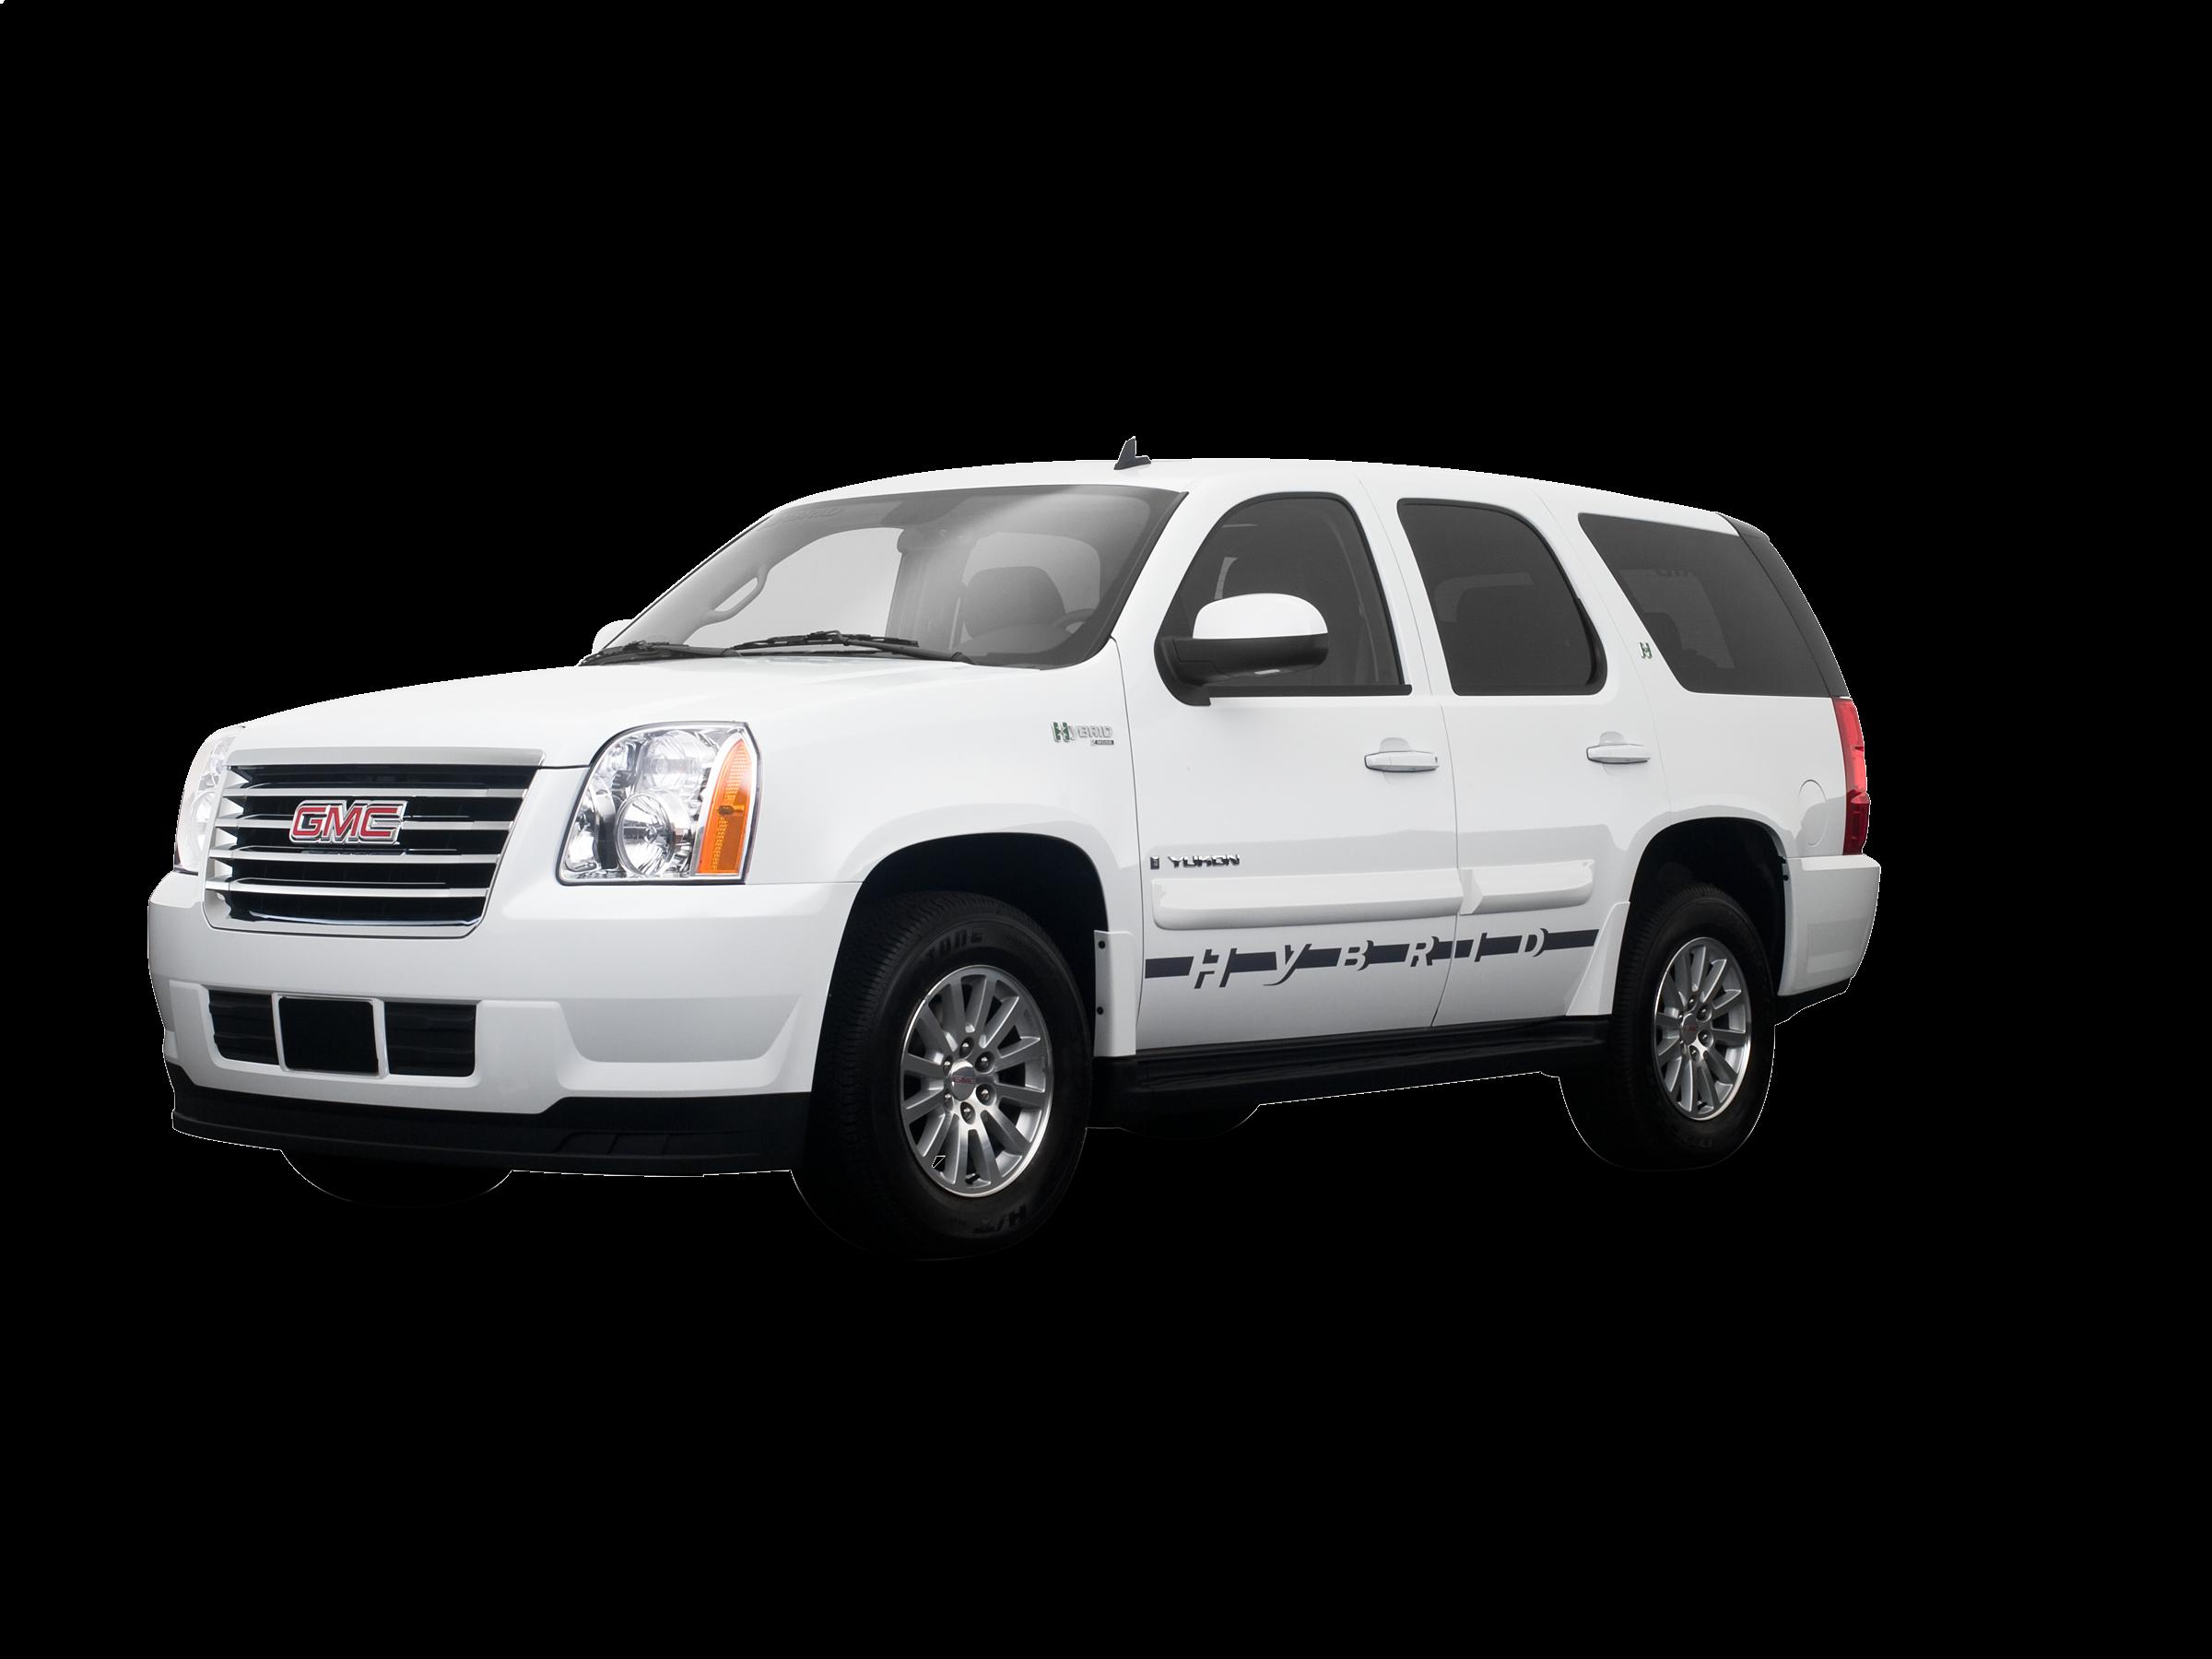 2009 Gmc Yukon Values Cars For Sale Kelley Blue Book